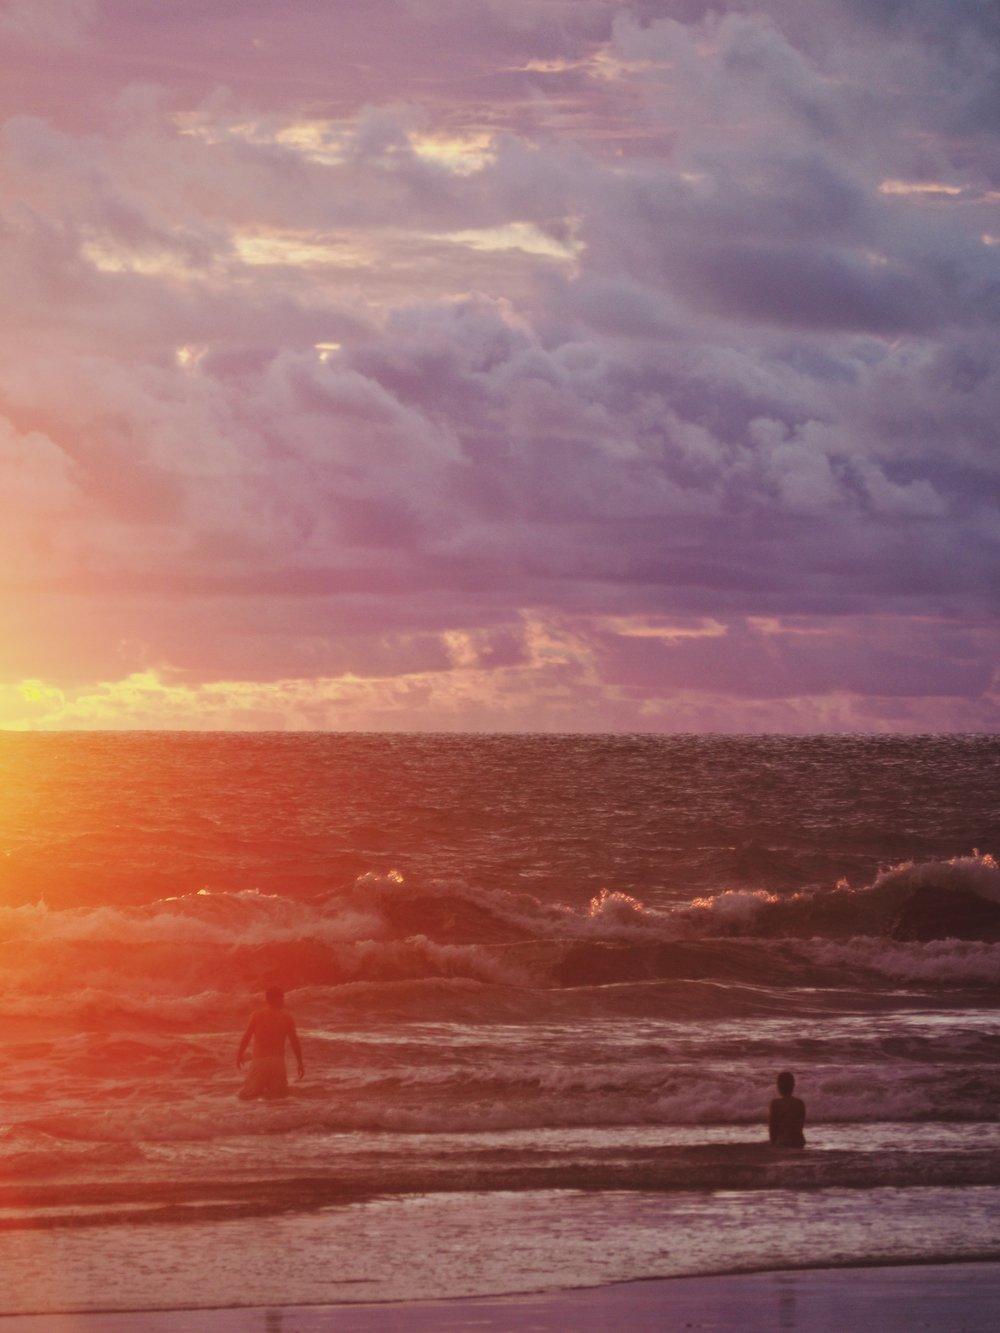 Sunset at Playa Ventanas